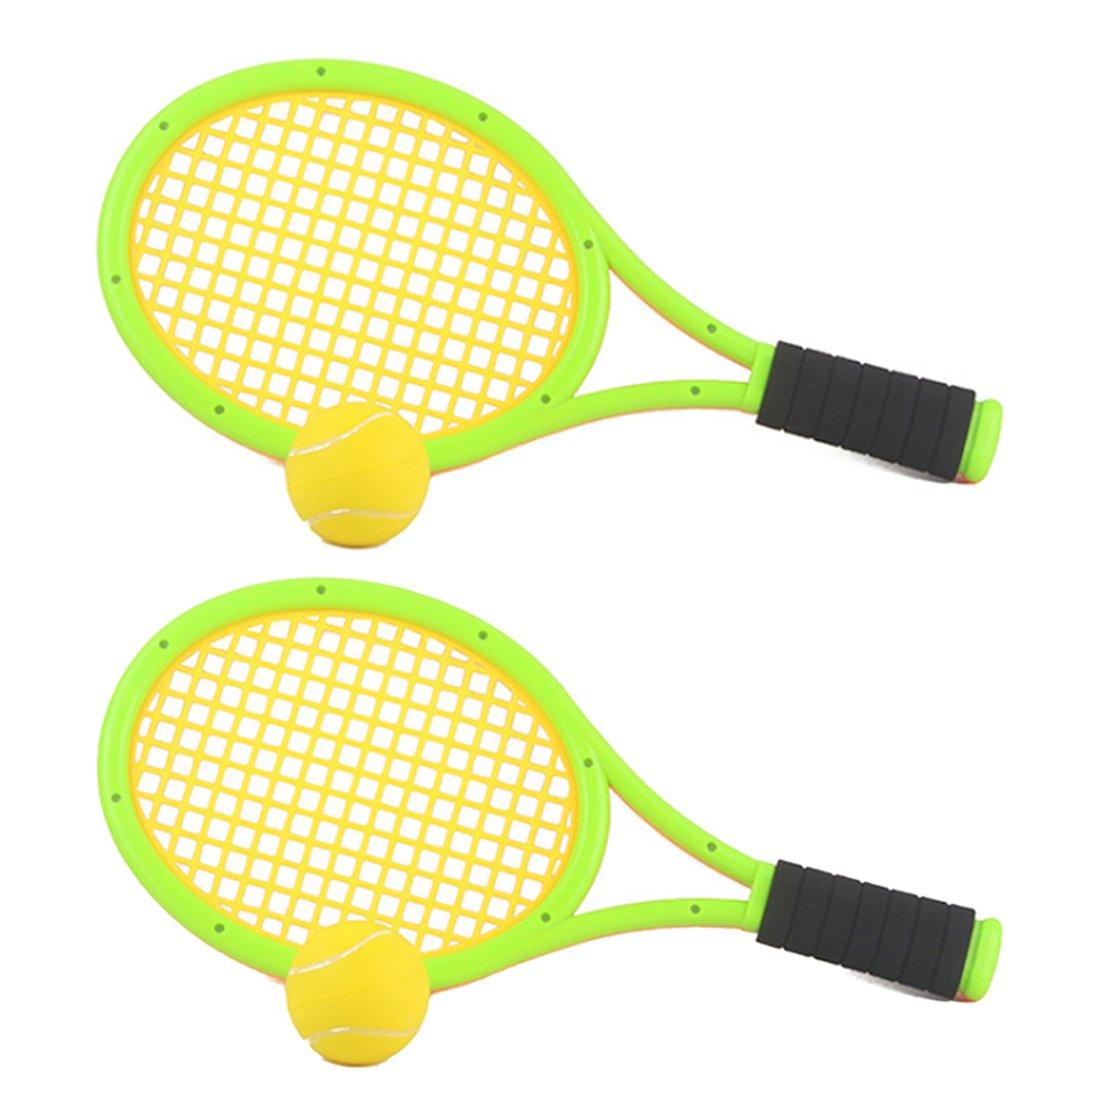 FenglinTech Elastic Tennis Childrens Outdoor